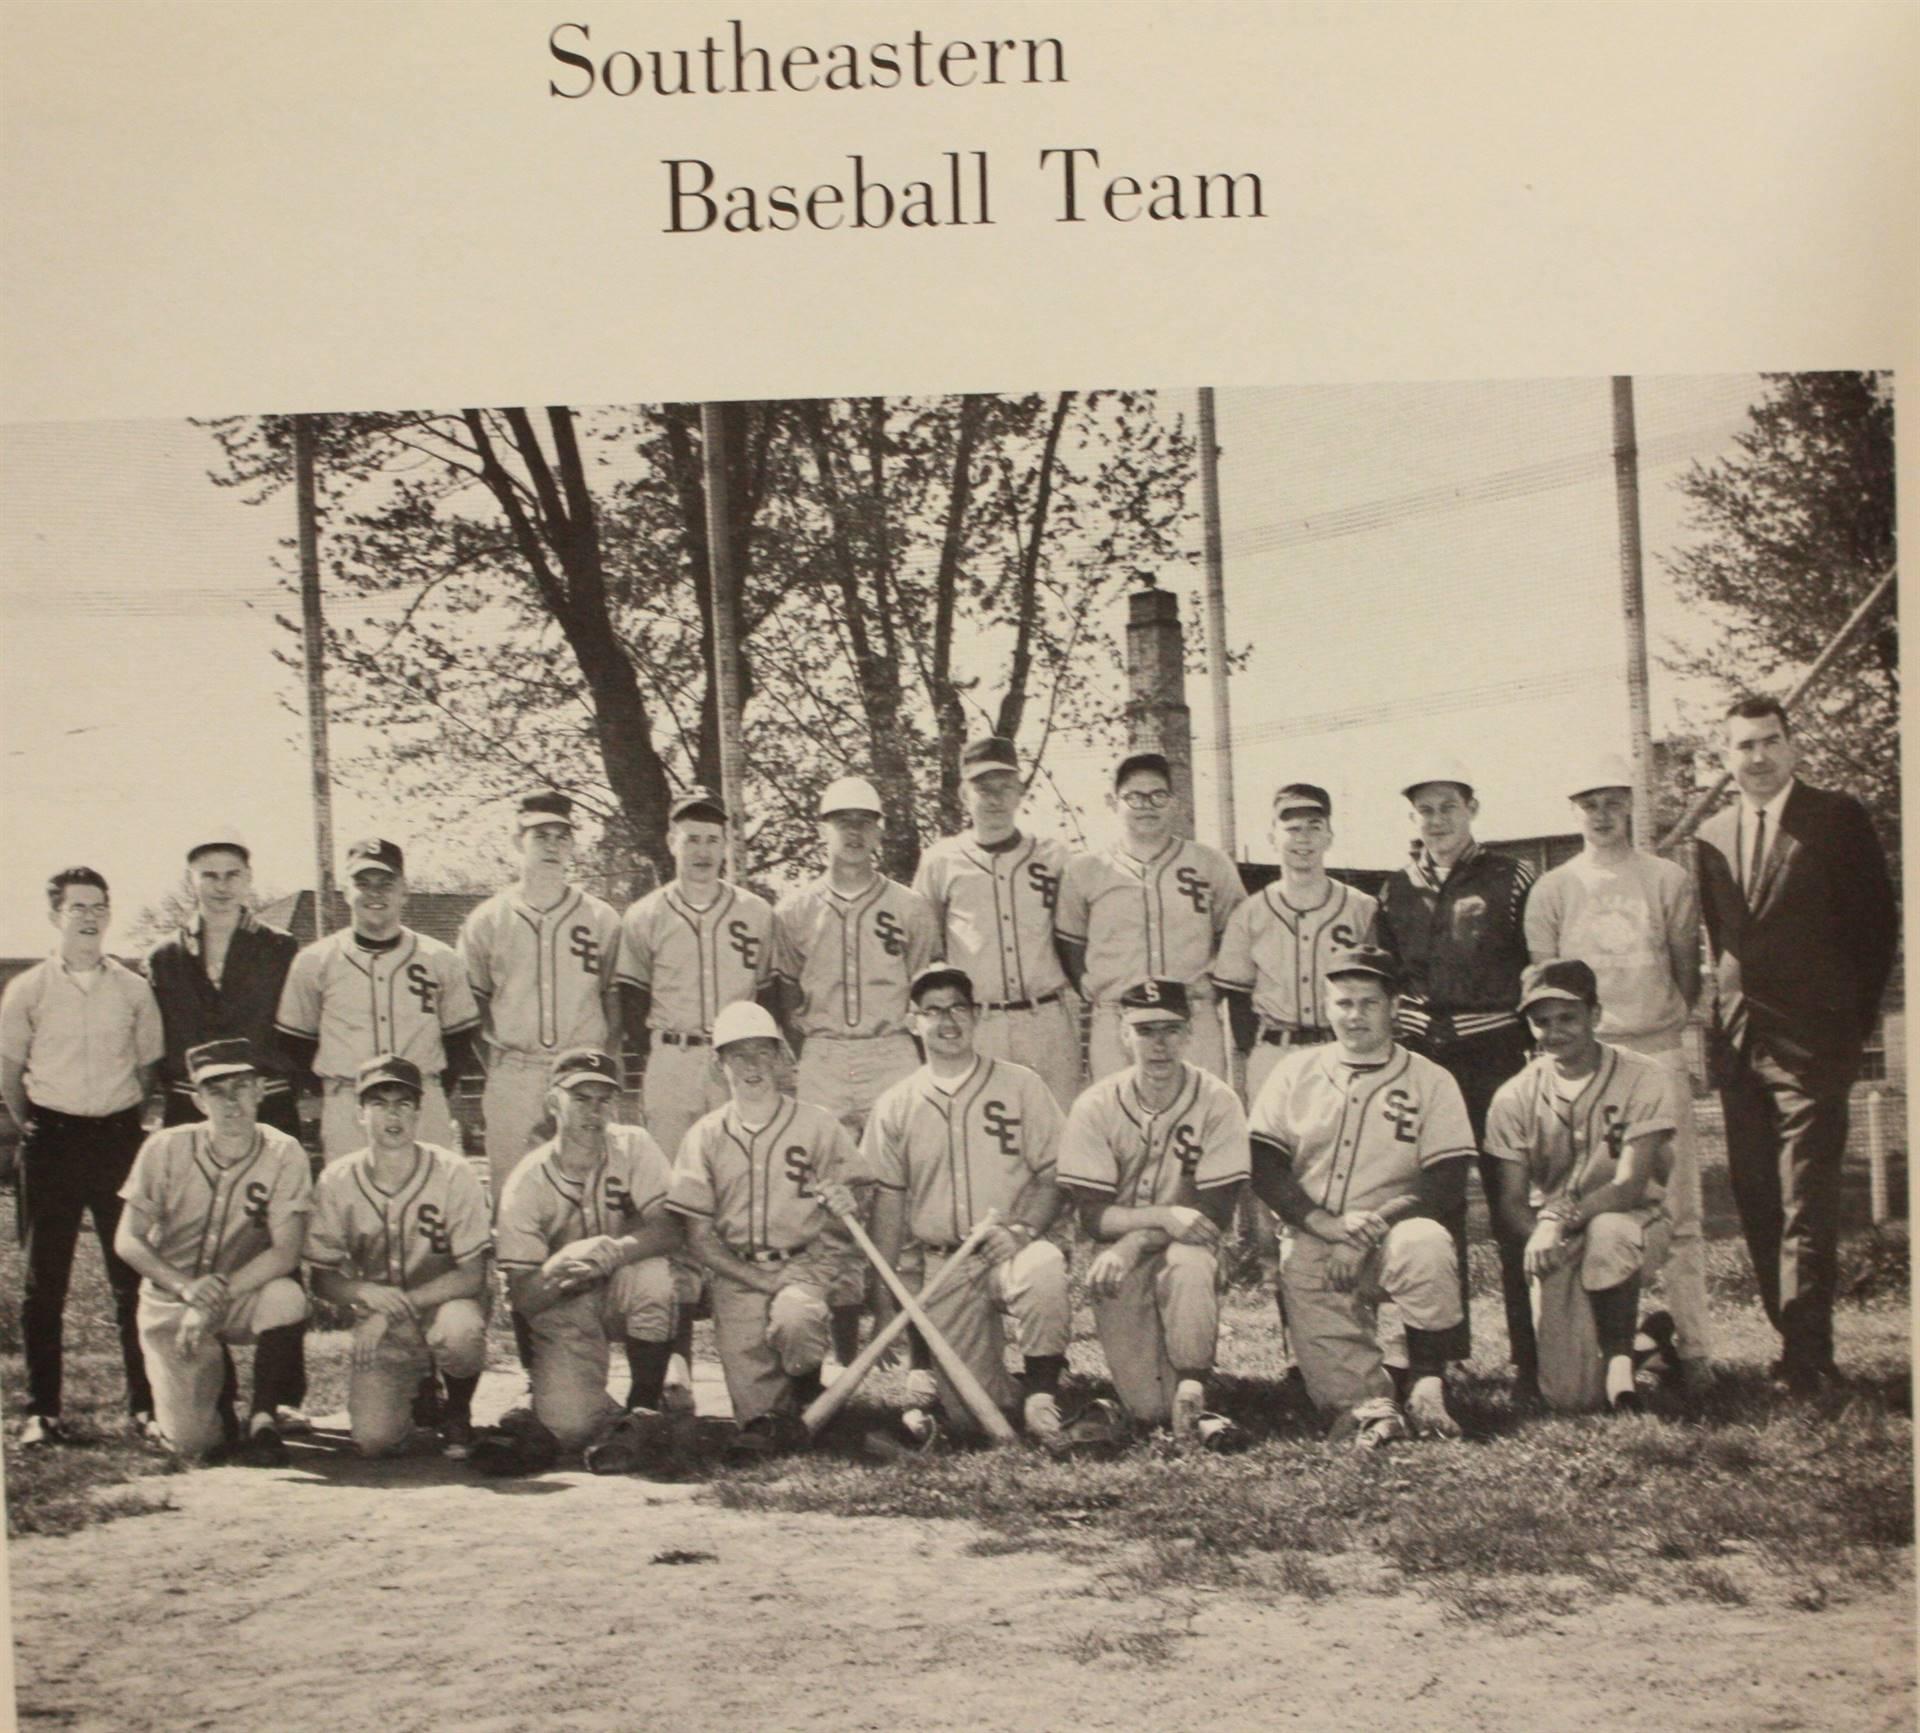 1966 Southeastern Baseball Team